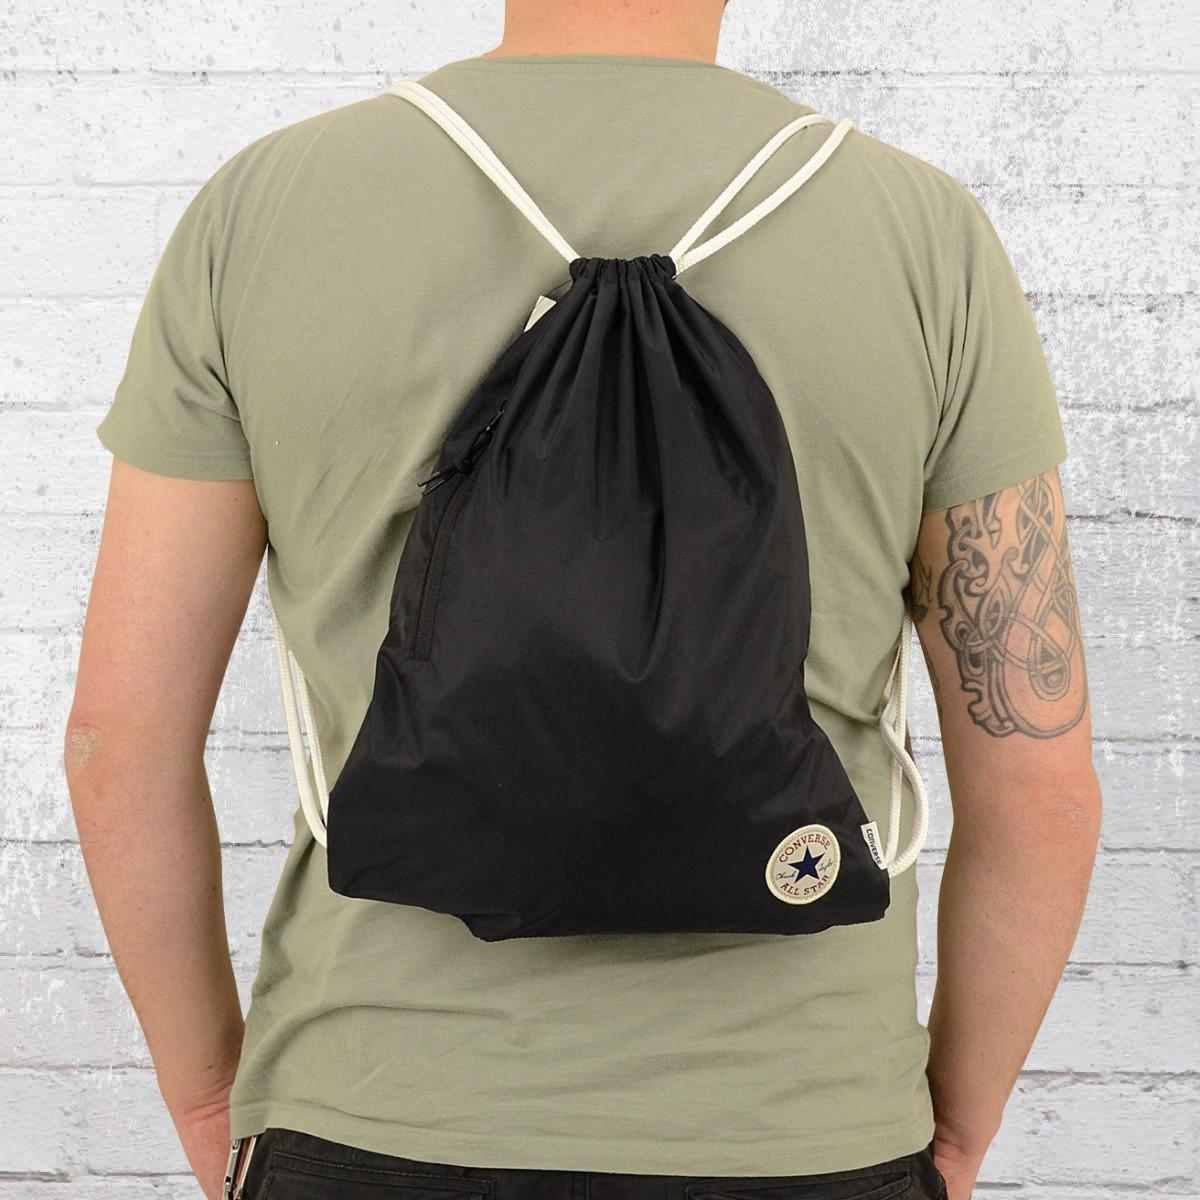 Have you seen  Converse Gym Bag Cinch ... 35eea6ab98b8d